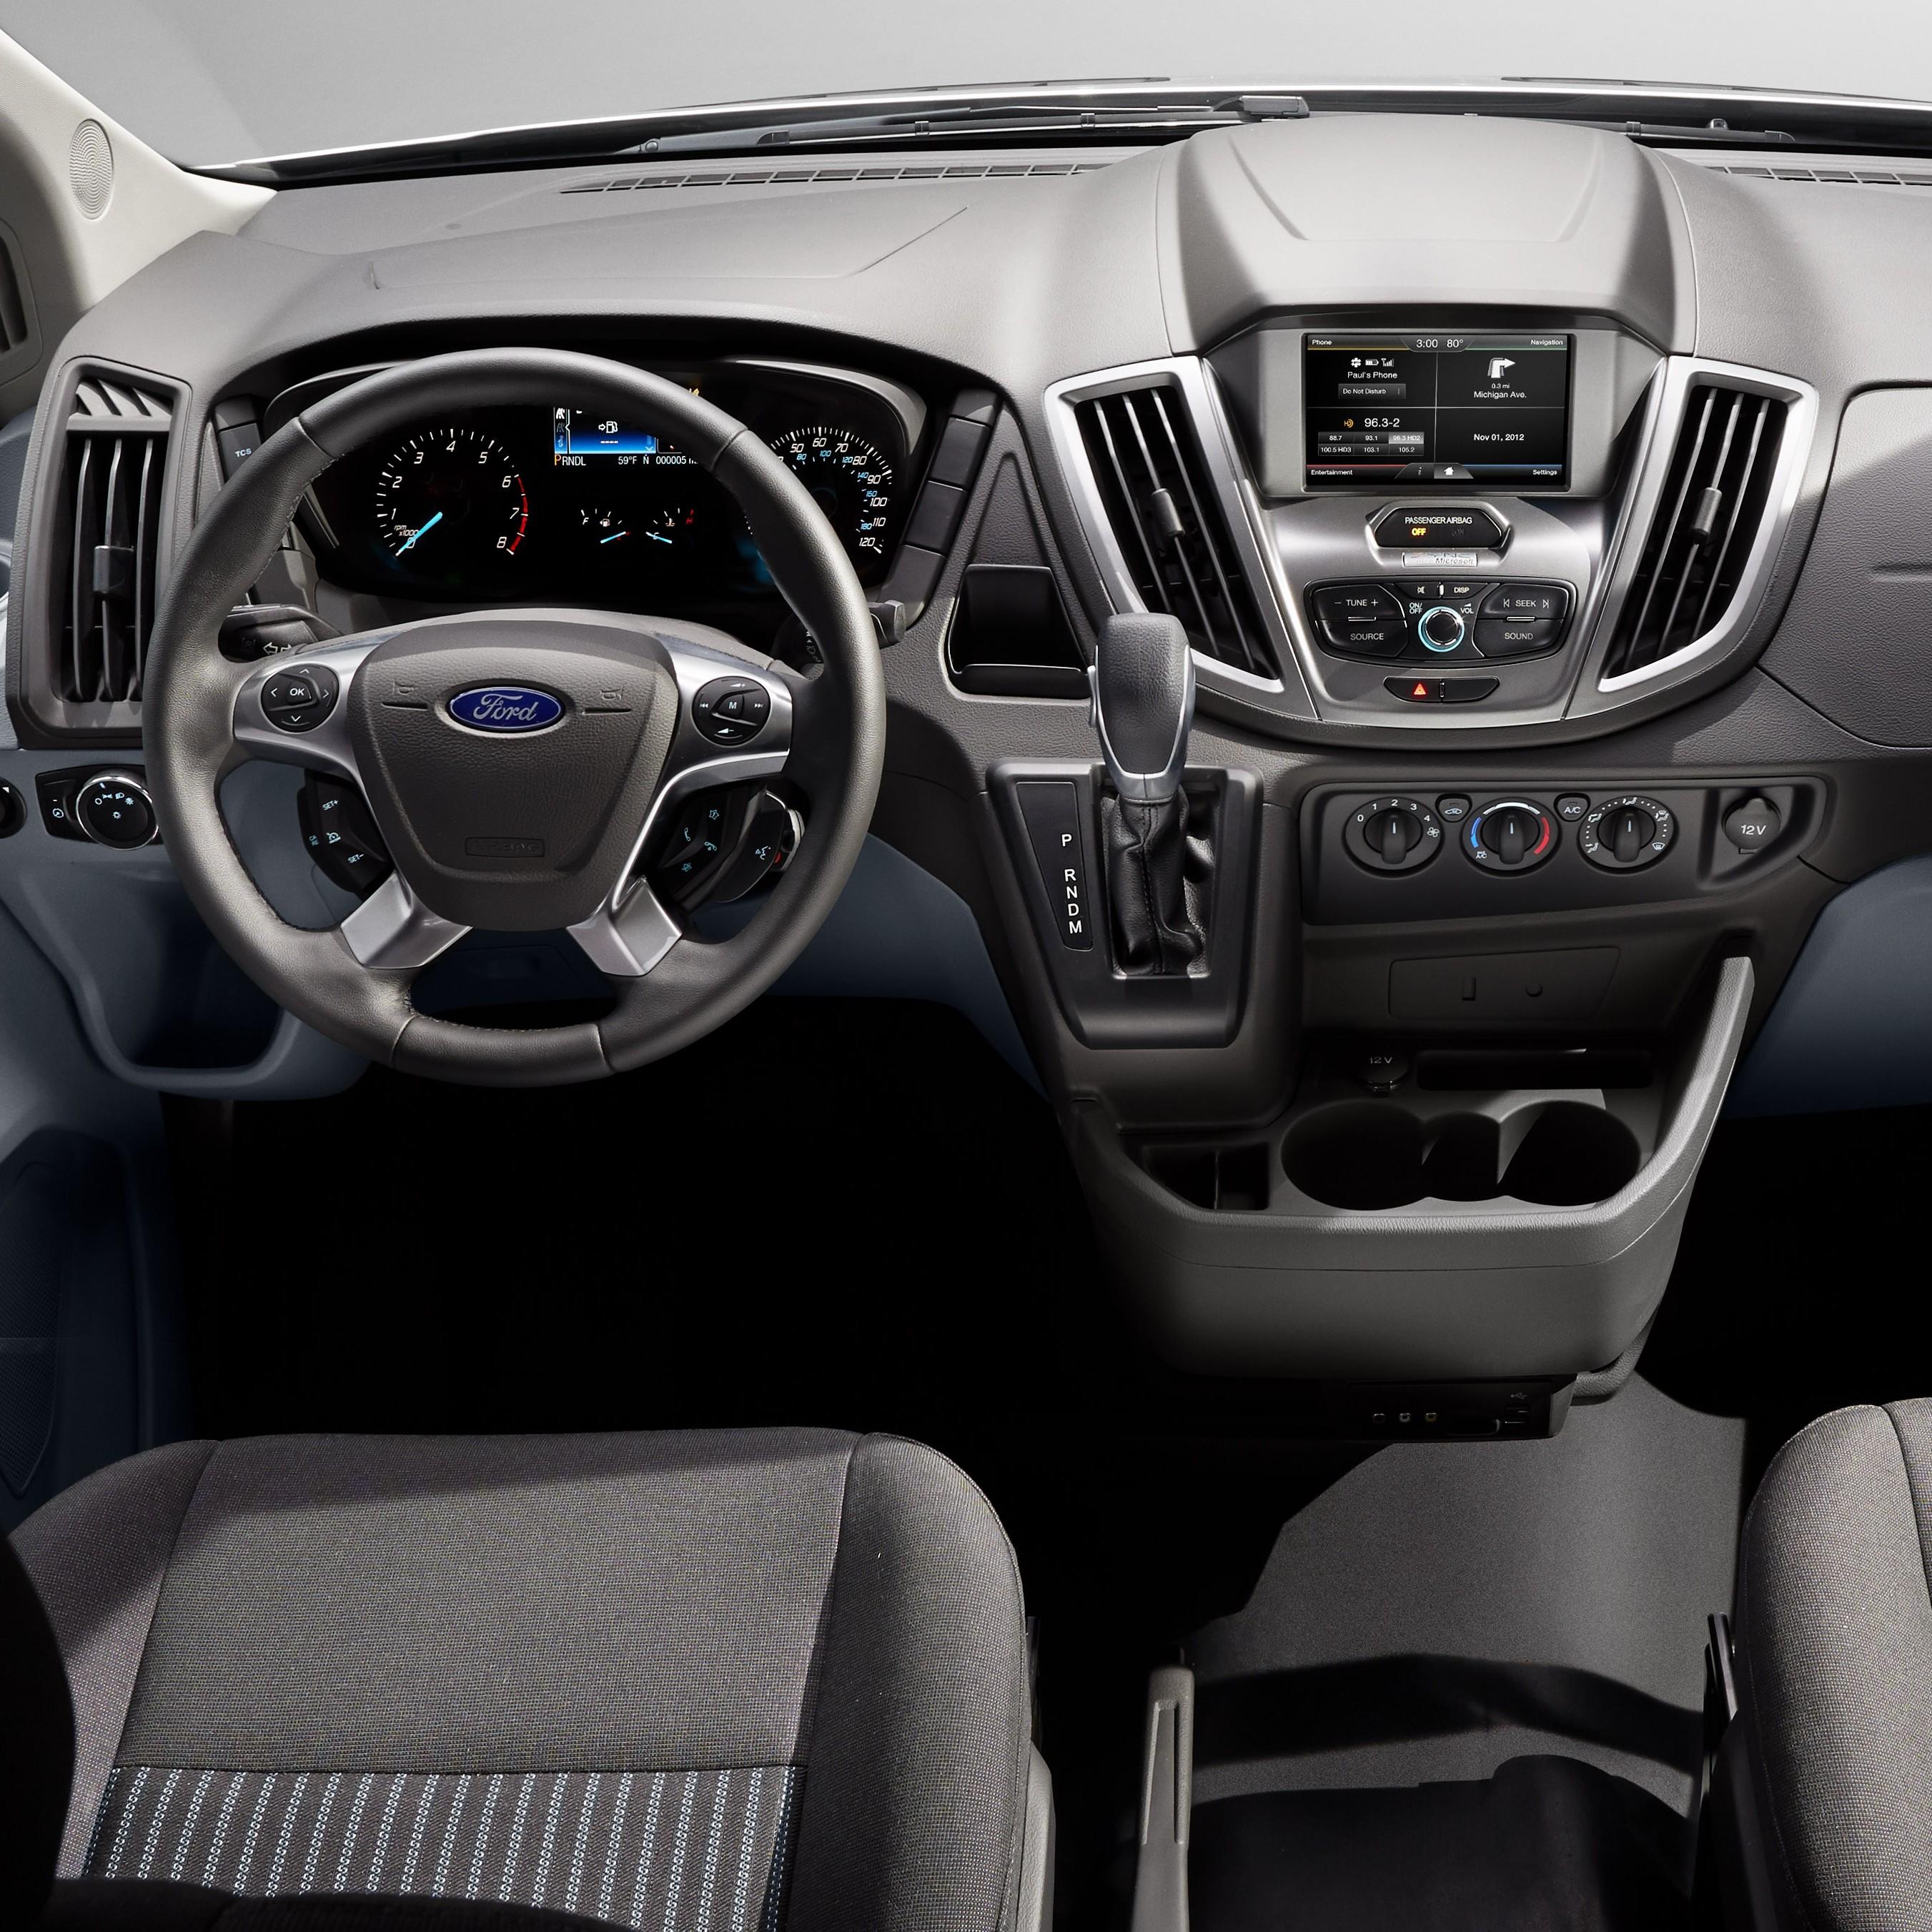 Seat Time 2015 Ford Transit 250 HR – John s Journal on Autoline